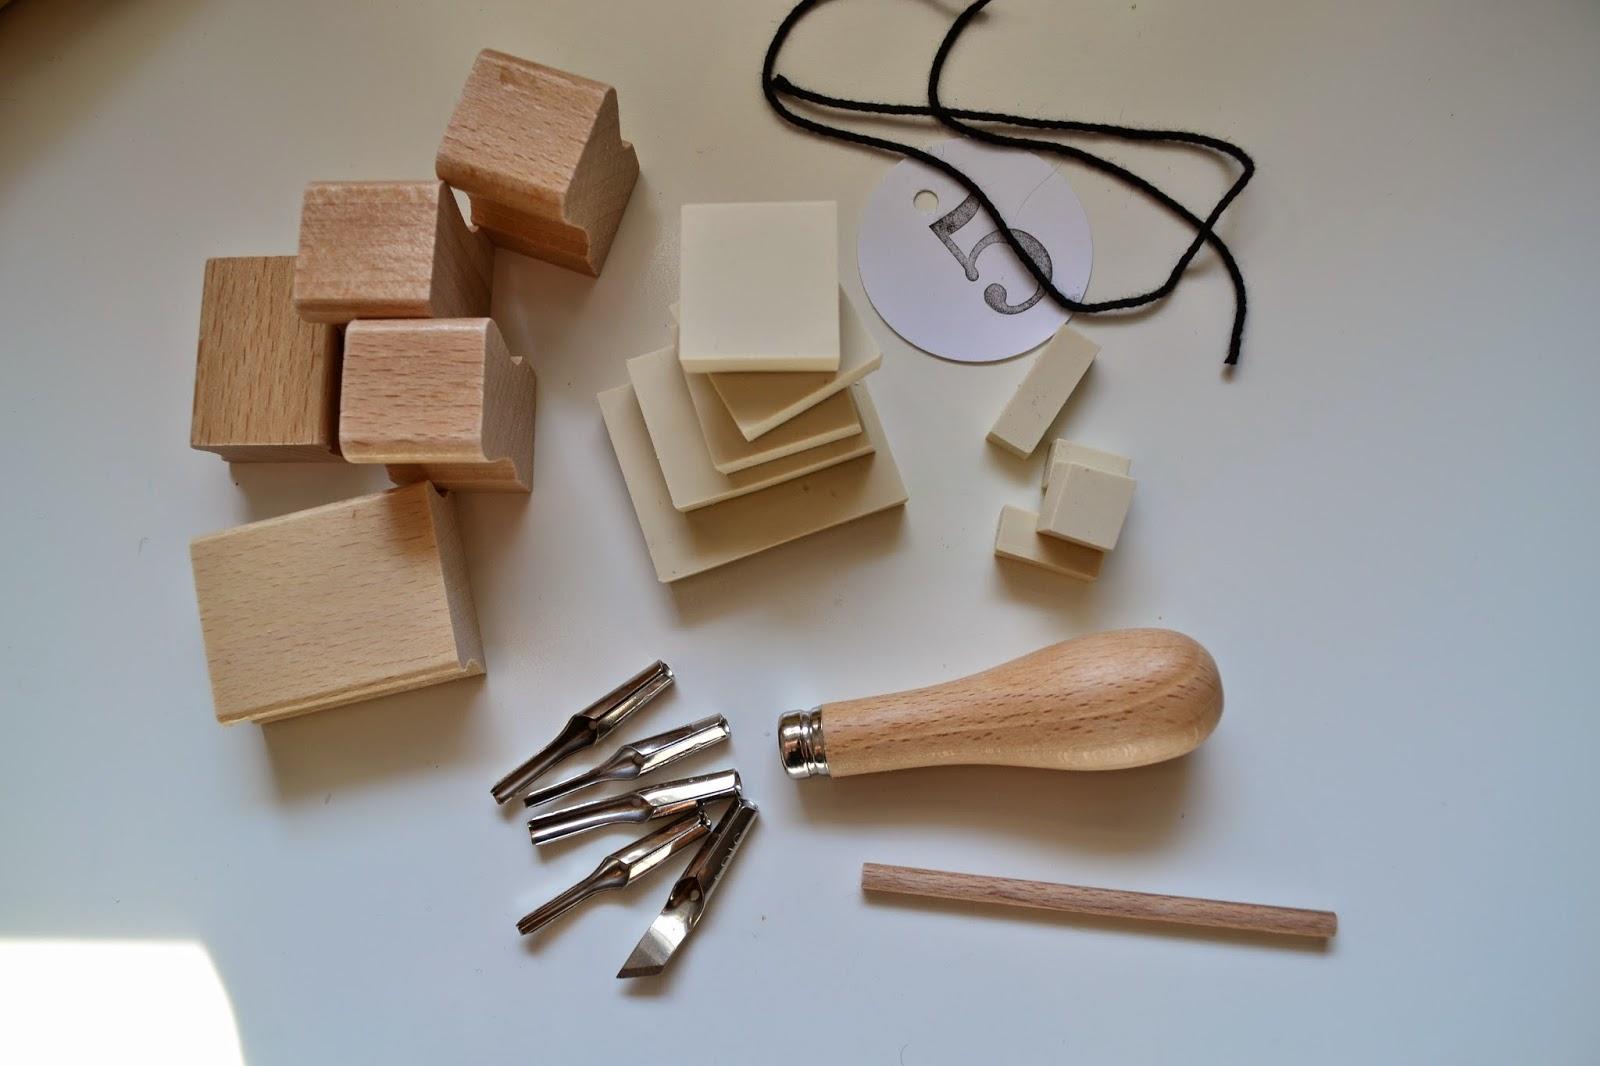 stempel selbst machen stempel selber machen stempel selber machen 11 diy ideen mit anleitung. Black Bedroom Furniture Sets. Home Design Ideas